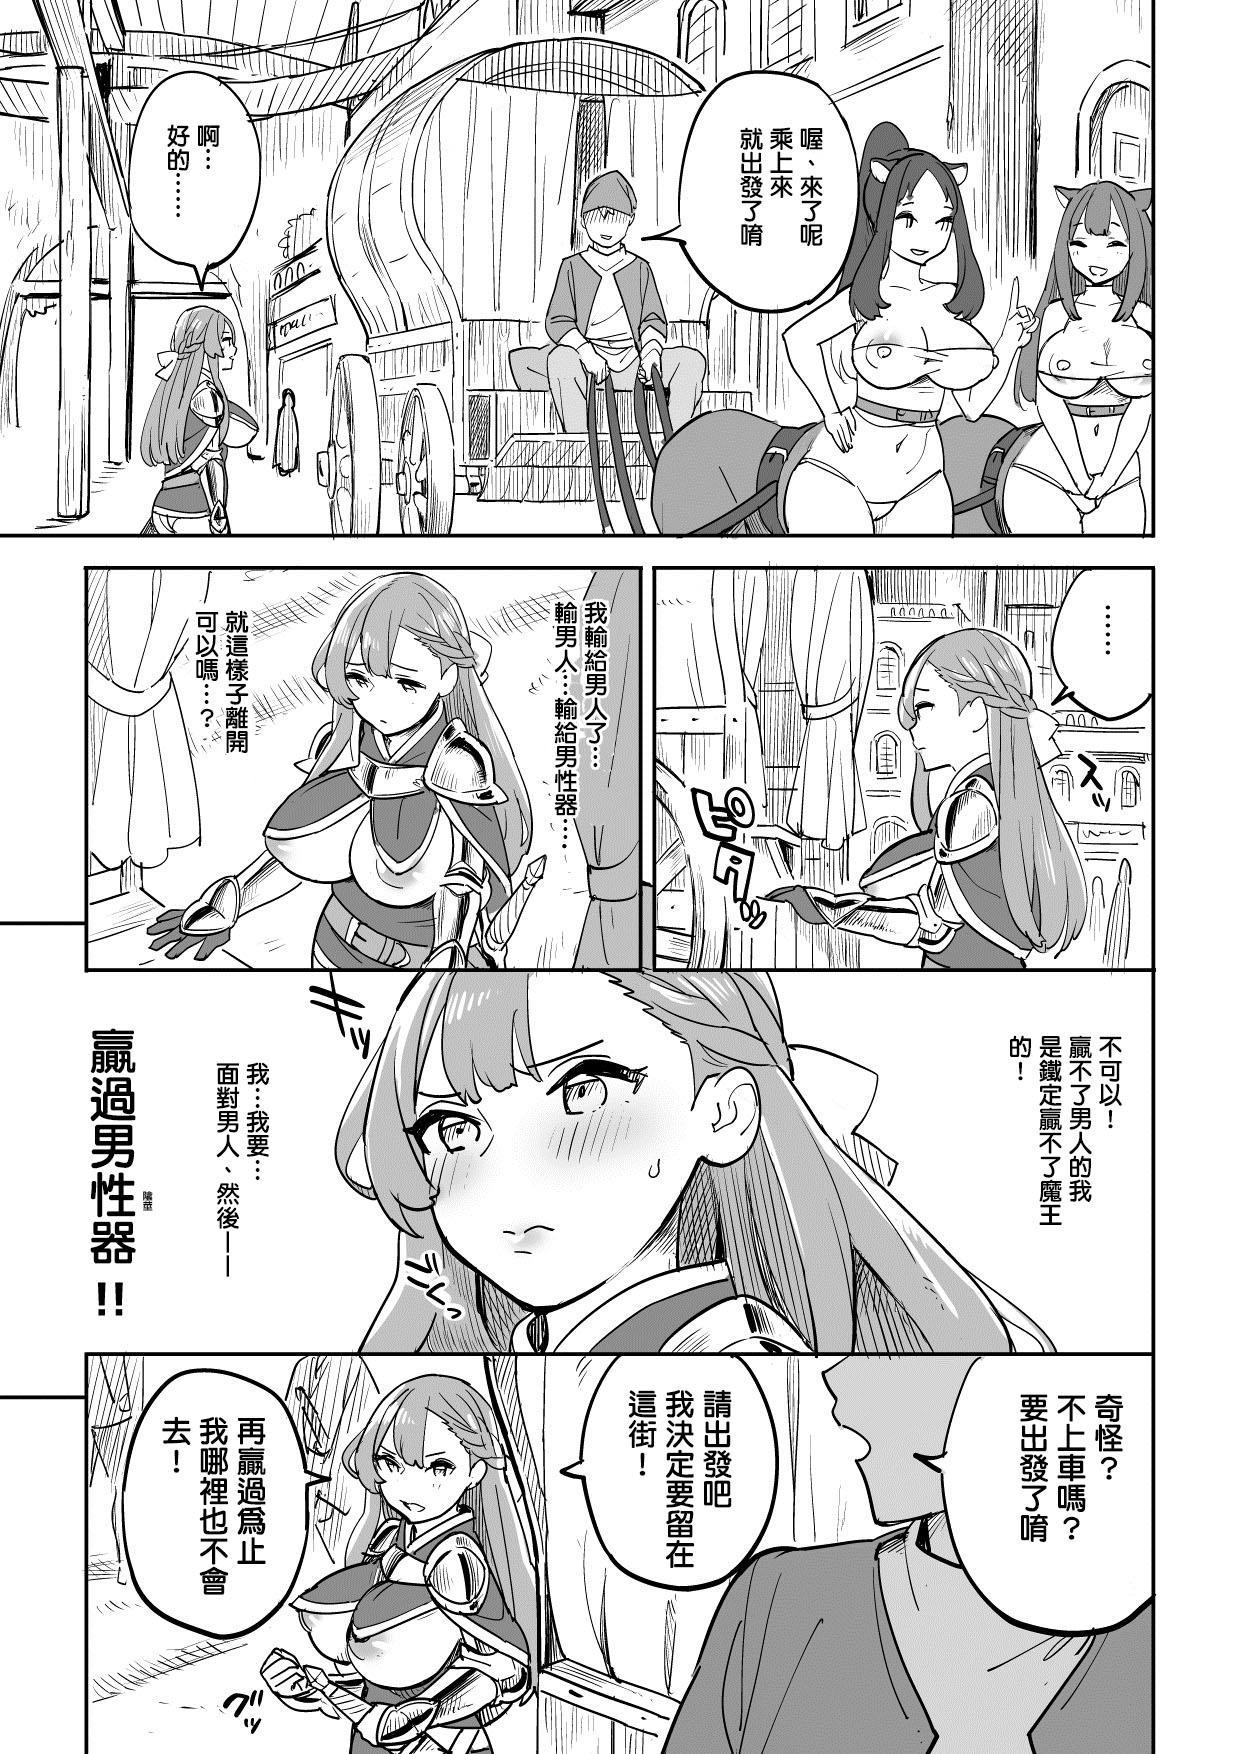 Tada no Yado ni wa Goyoujin! 26